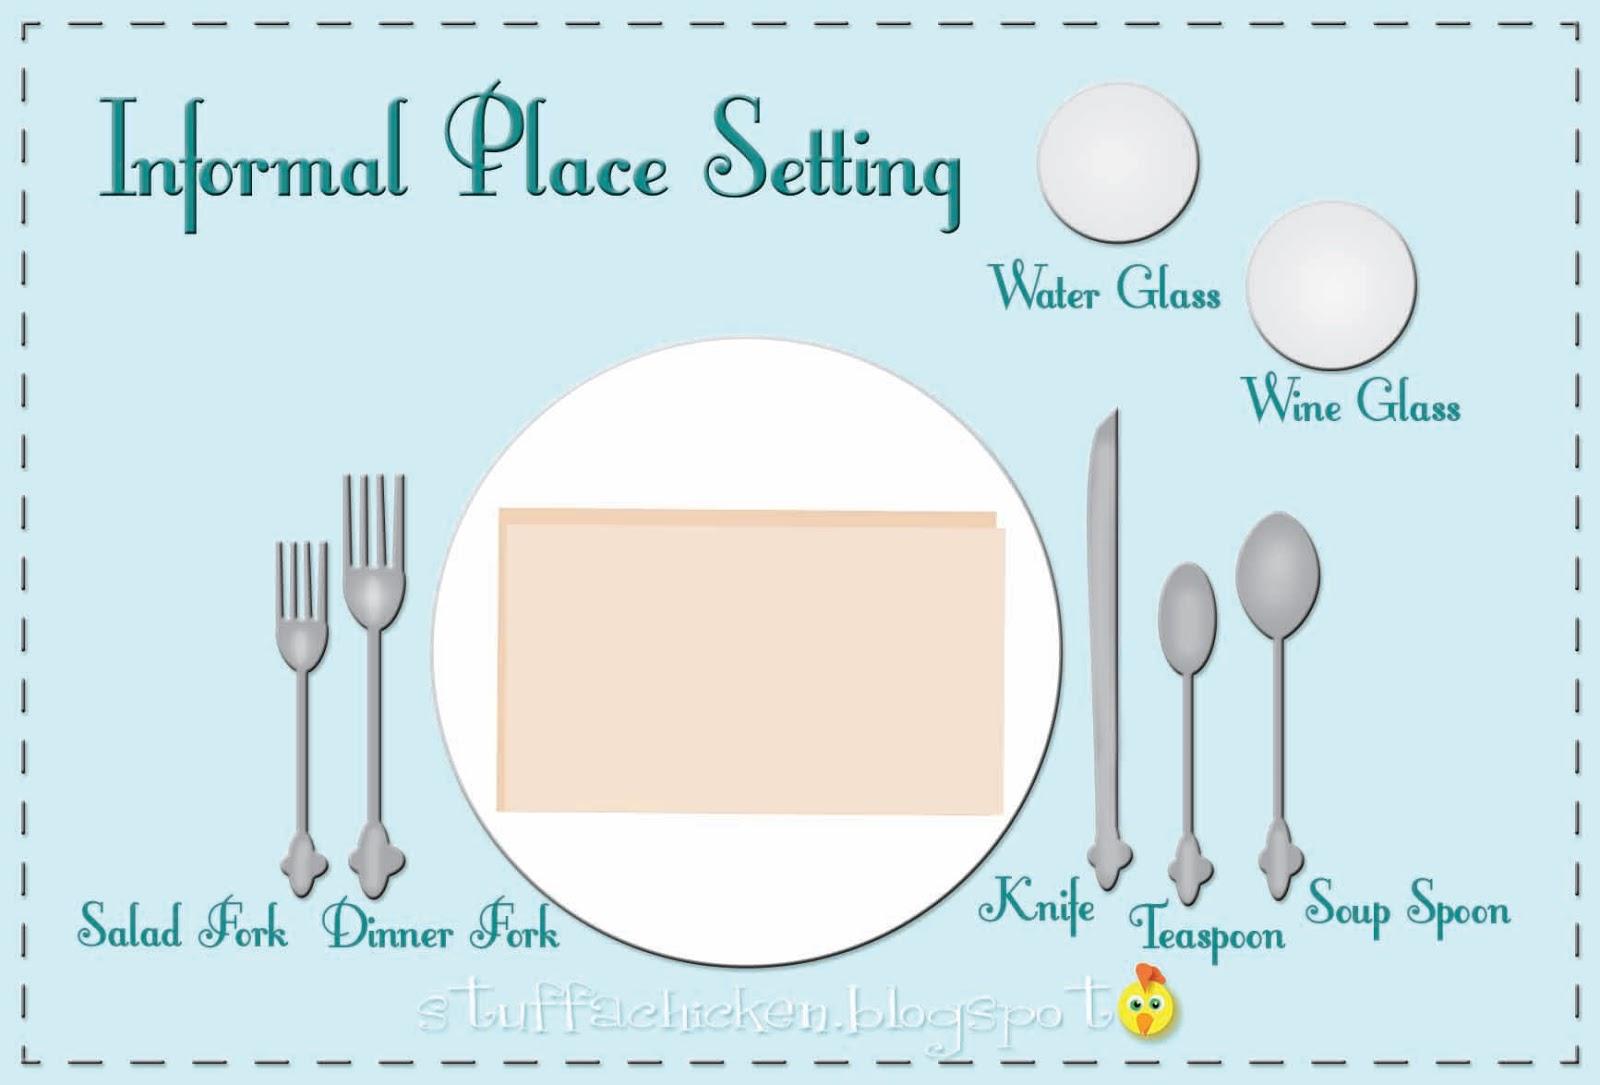 Informal table settings holiday table setting where - Formal dinner table setting etiquette ...